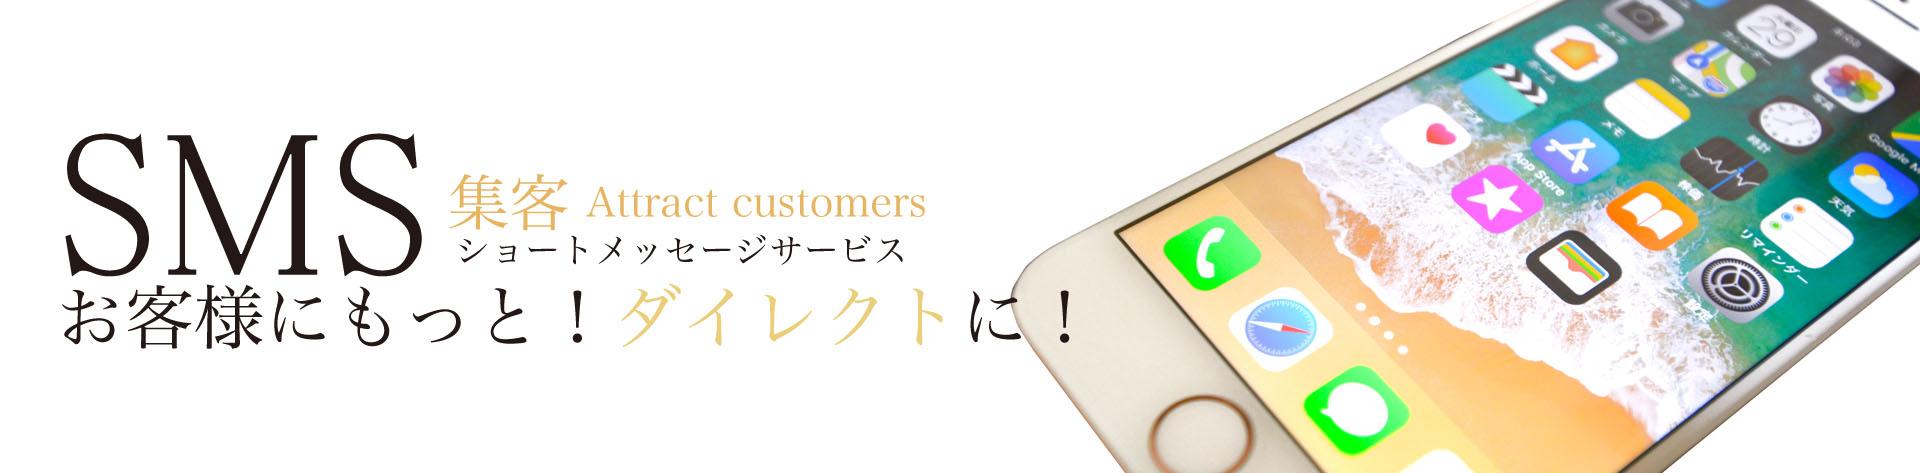 SMS集客広告